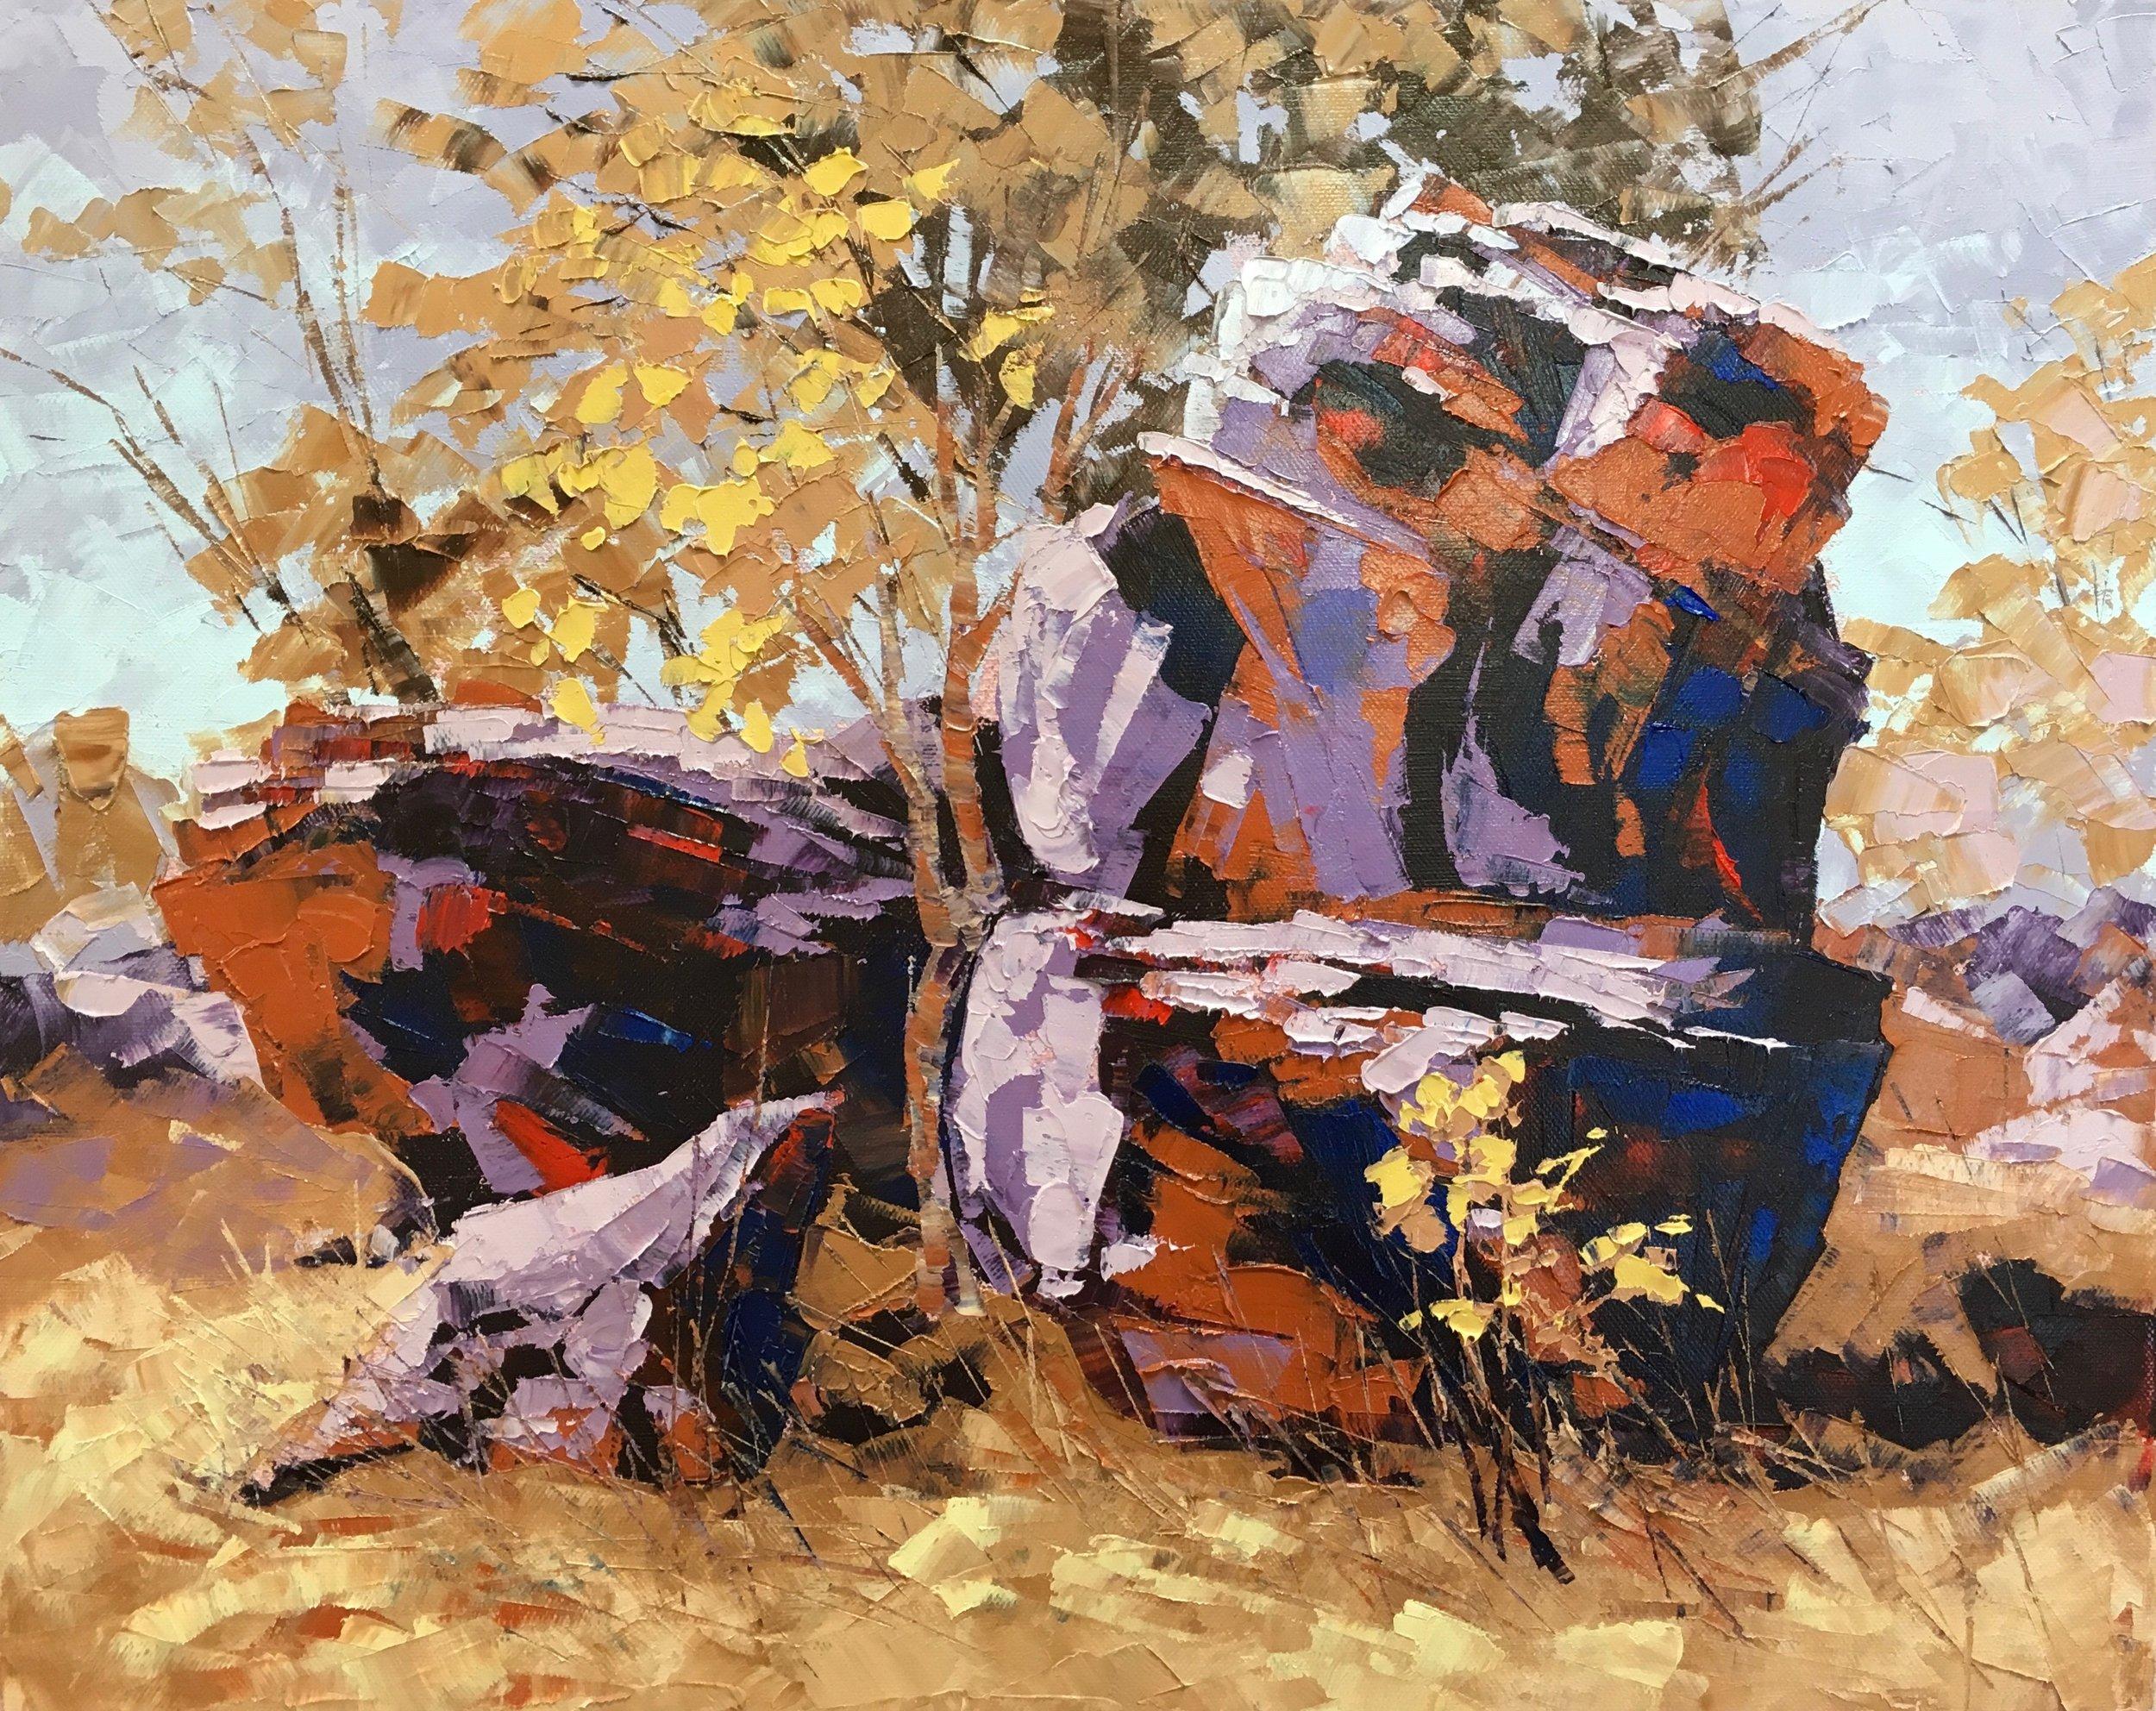 Wandjana Rock Art Gallery, Oil, Framed, 51 x 41cm,  $1,500